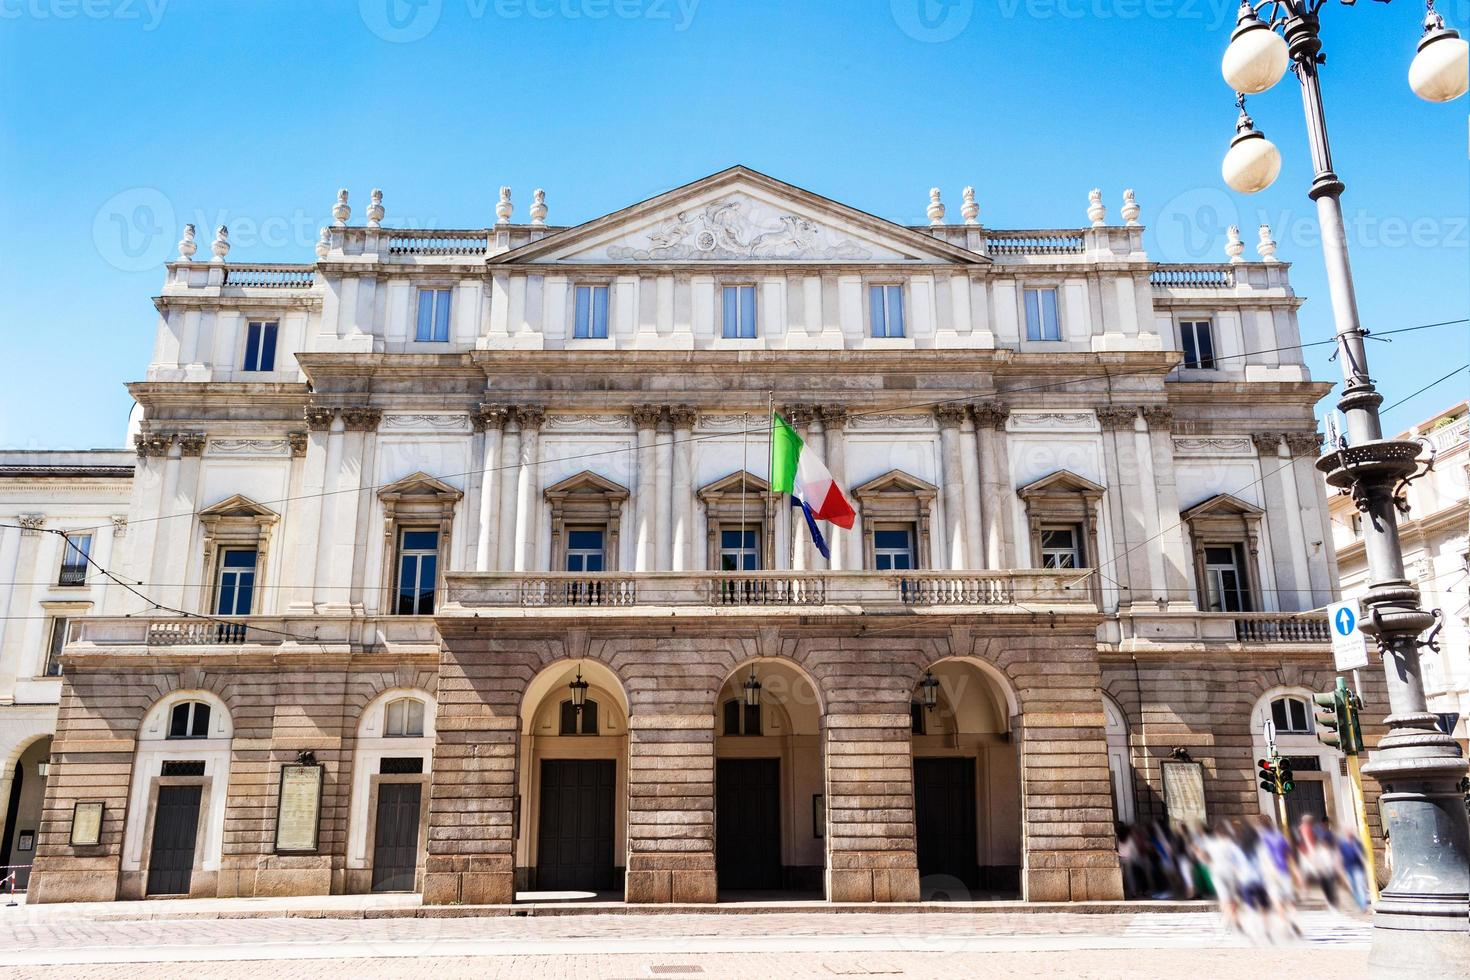 Scala theater in Milan, Italy photo